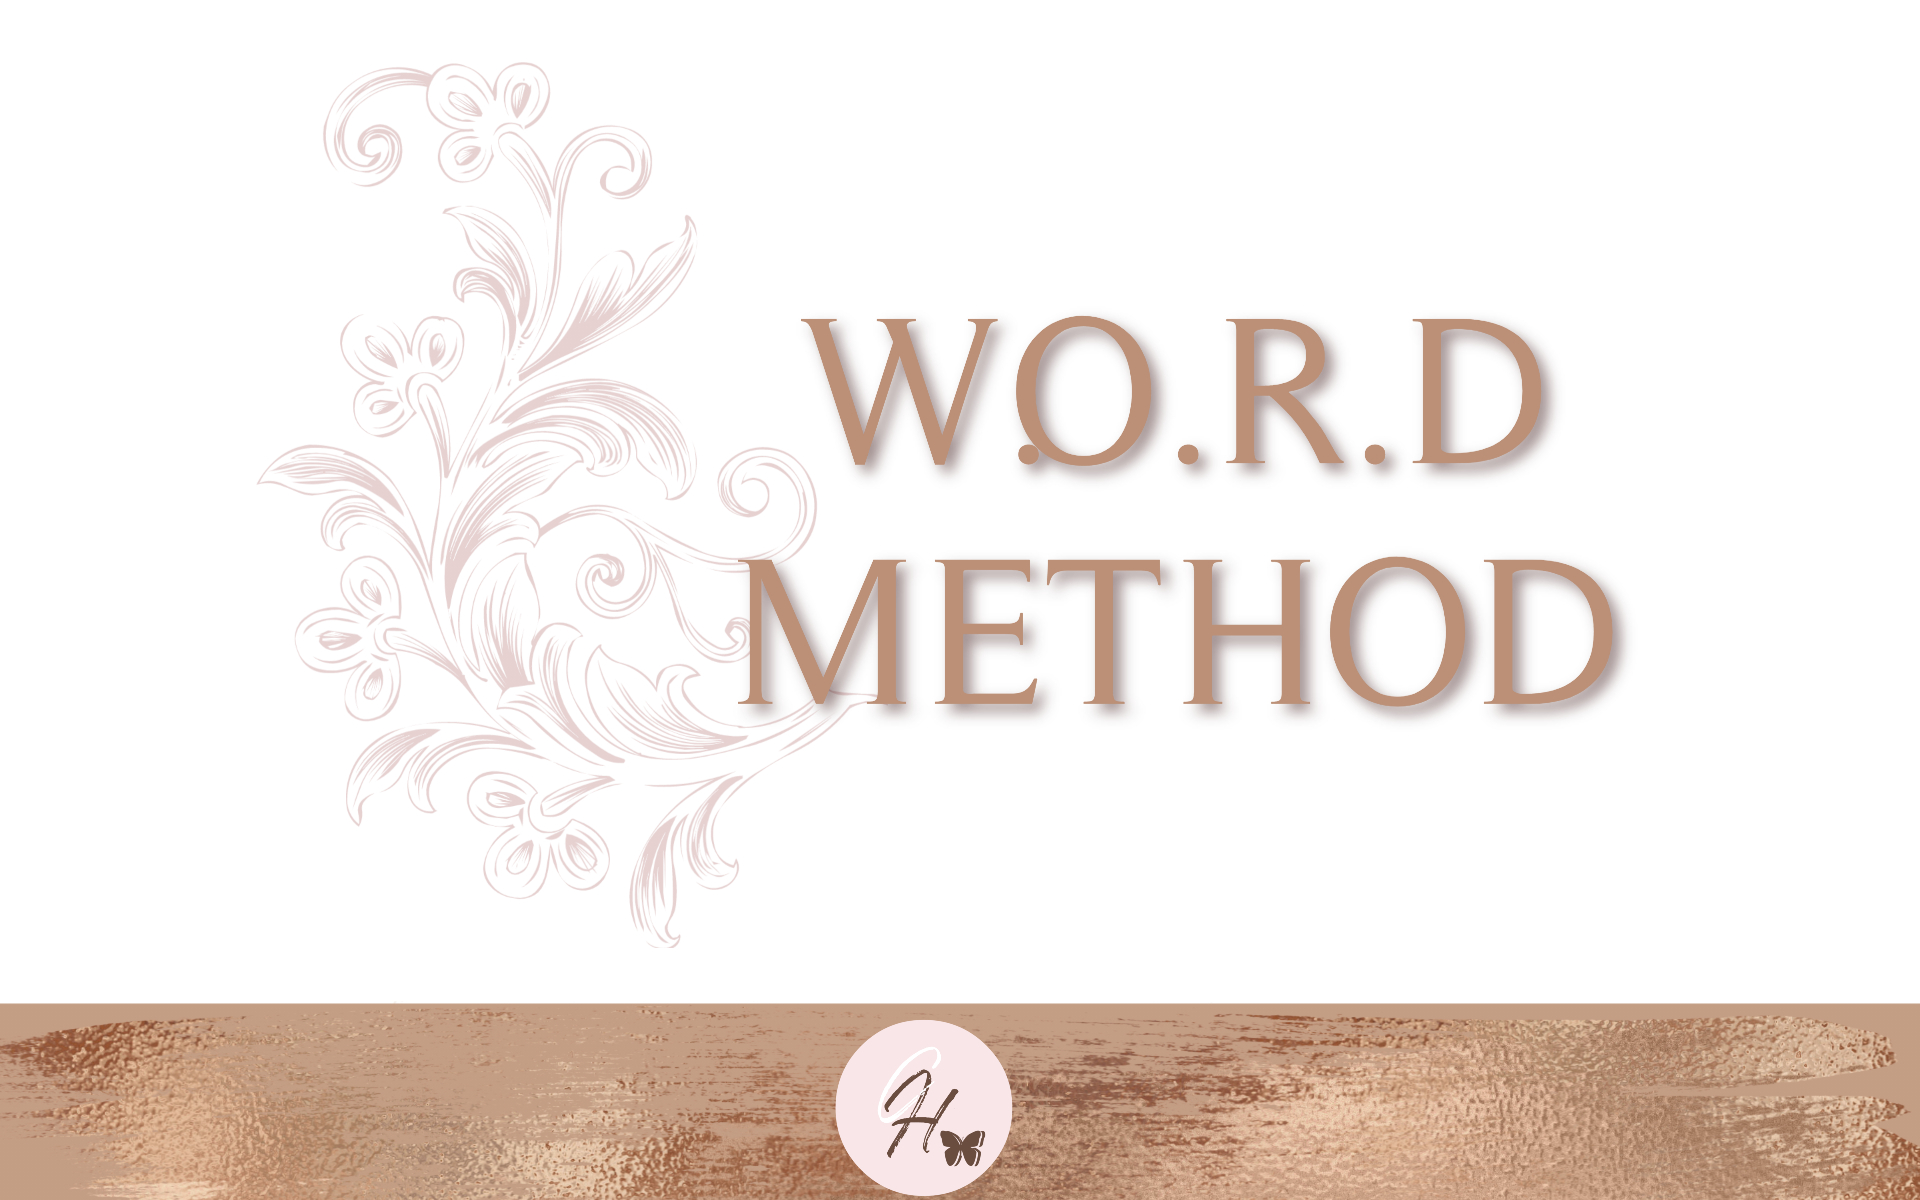 W.O.R.D Method